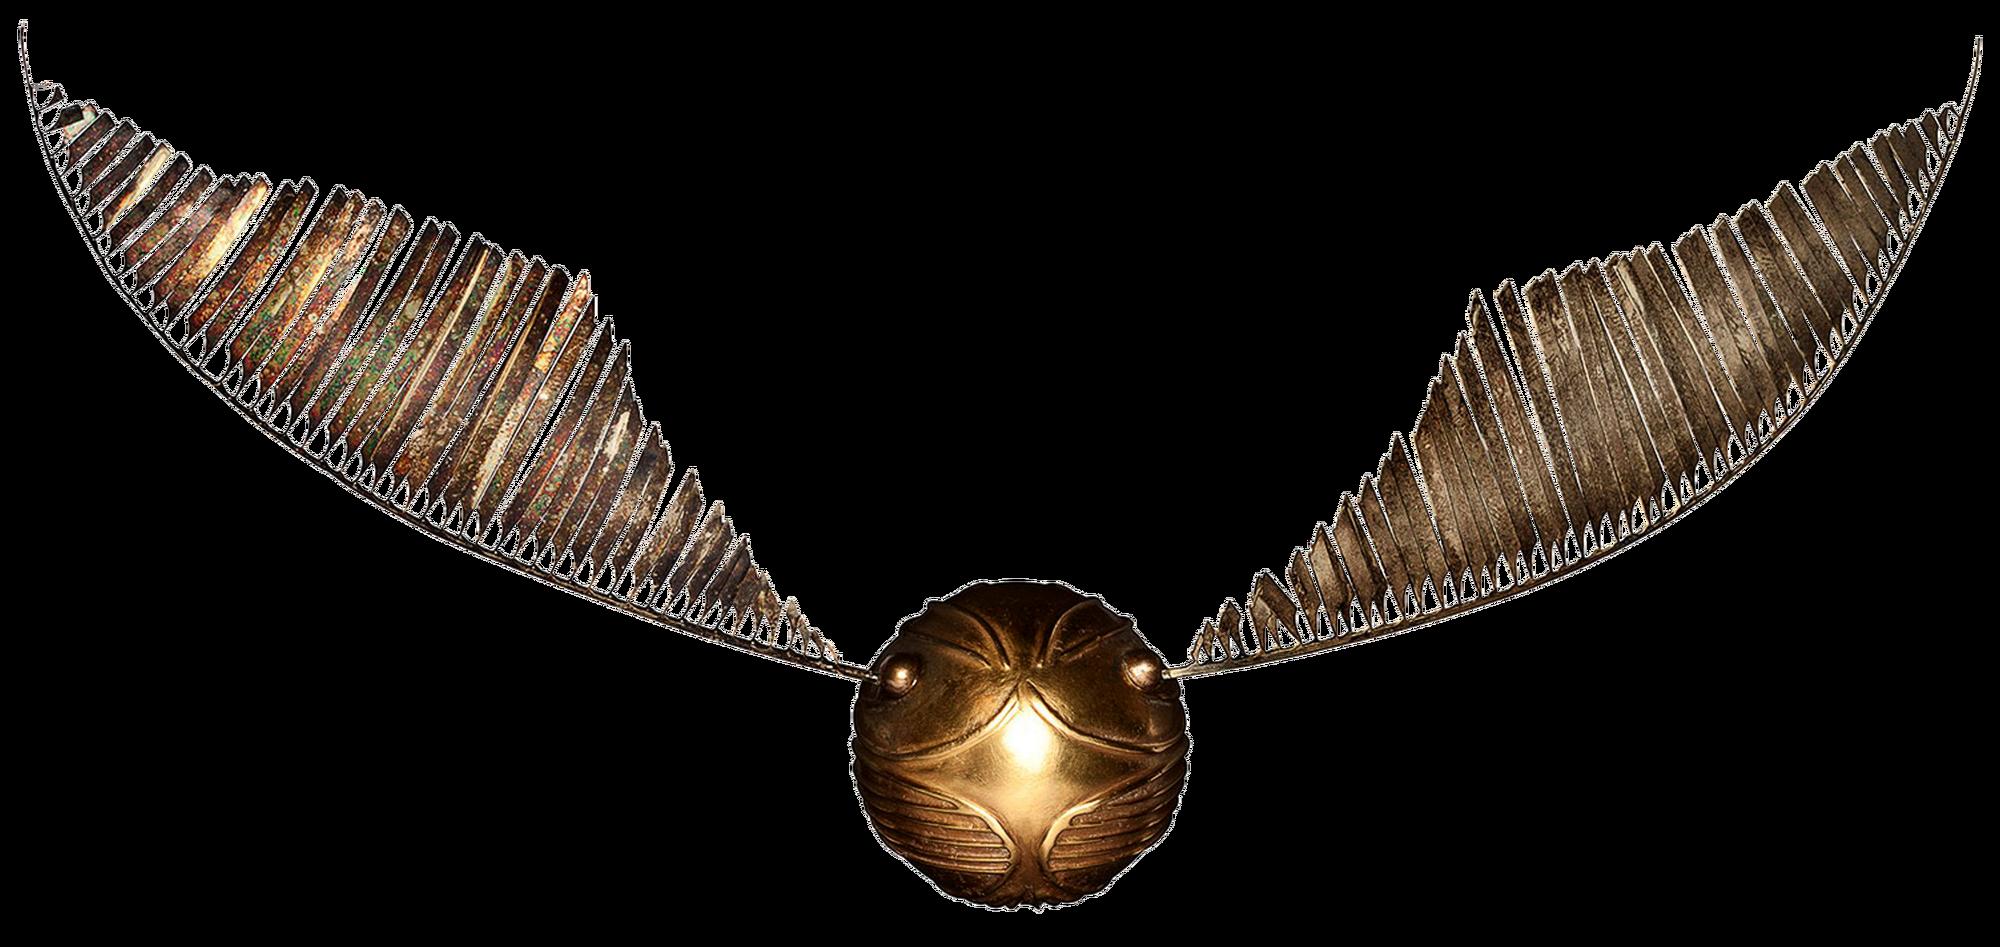 Golden Snitch Harry Potter Wiki Fandom